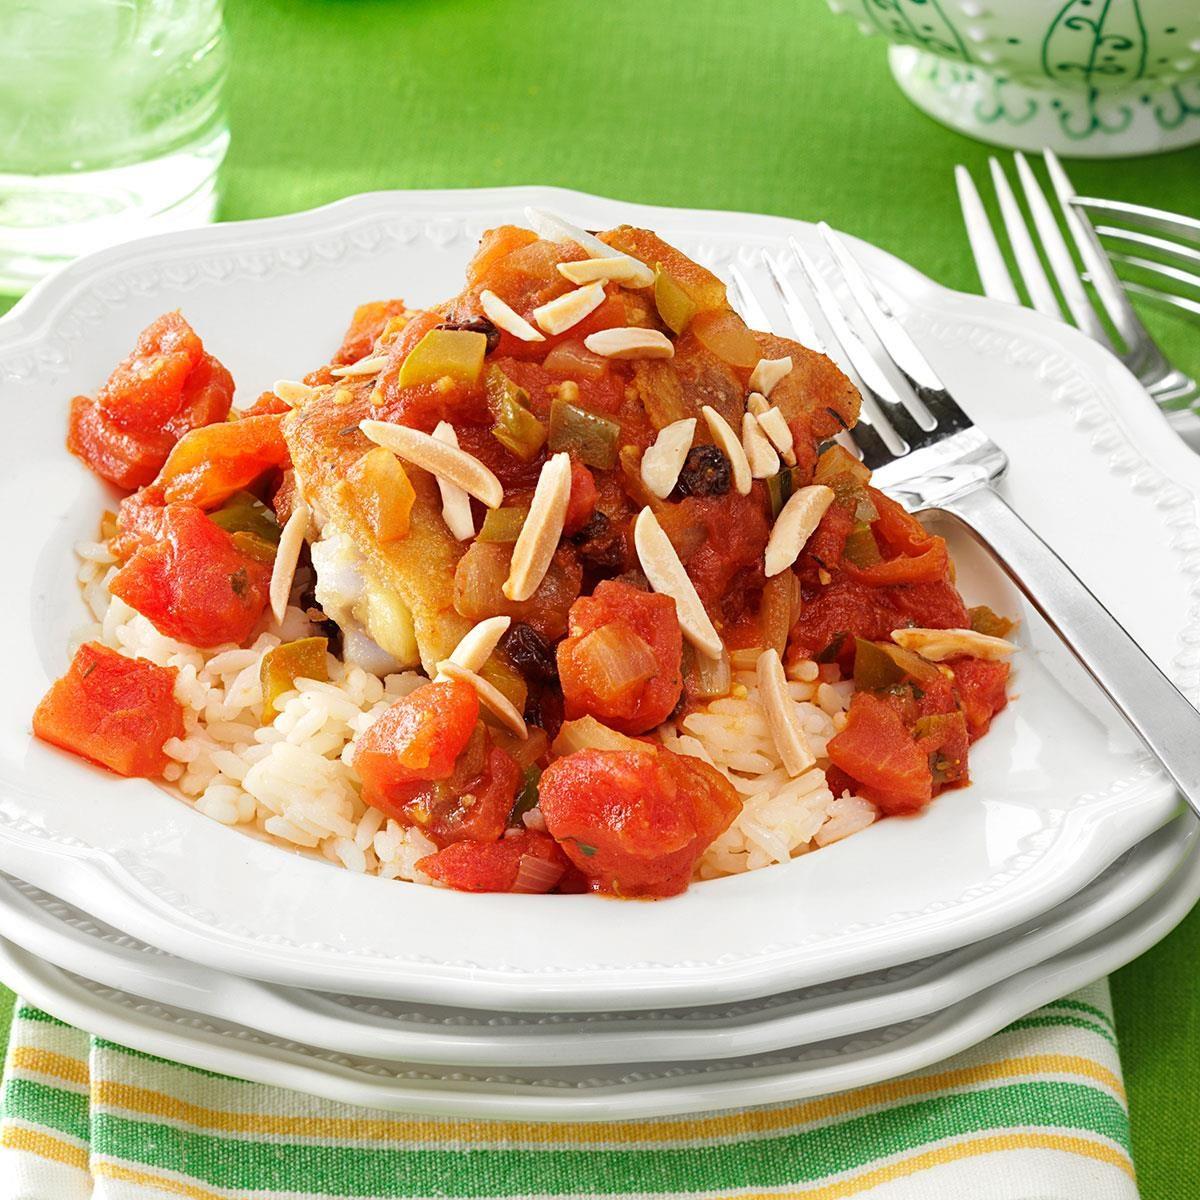 Sarah S Country Kitchen Menu